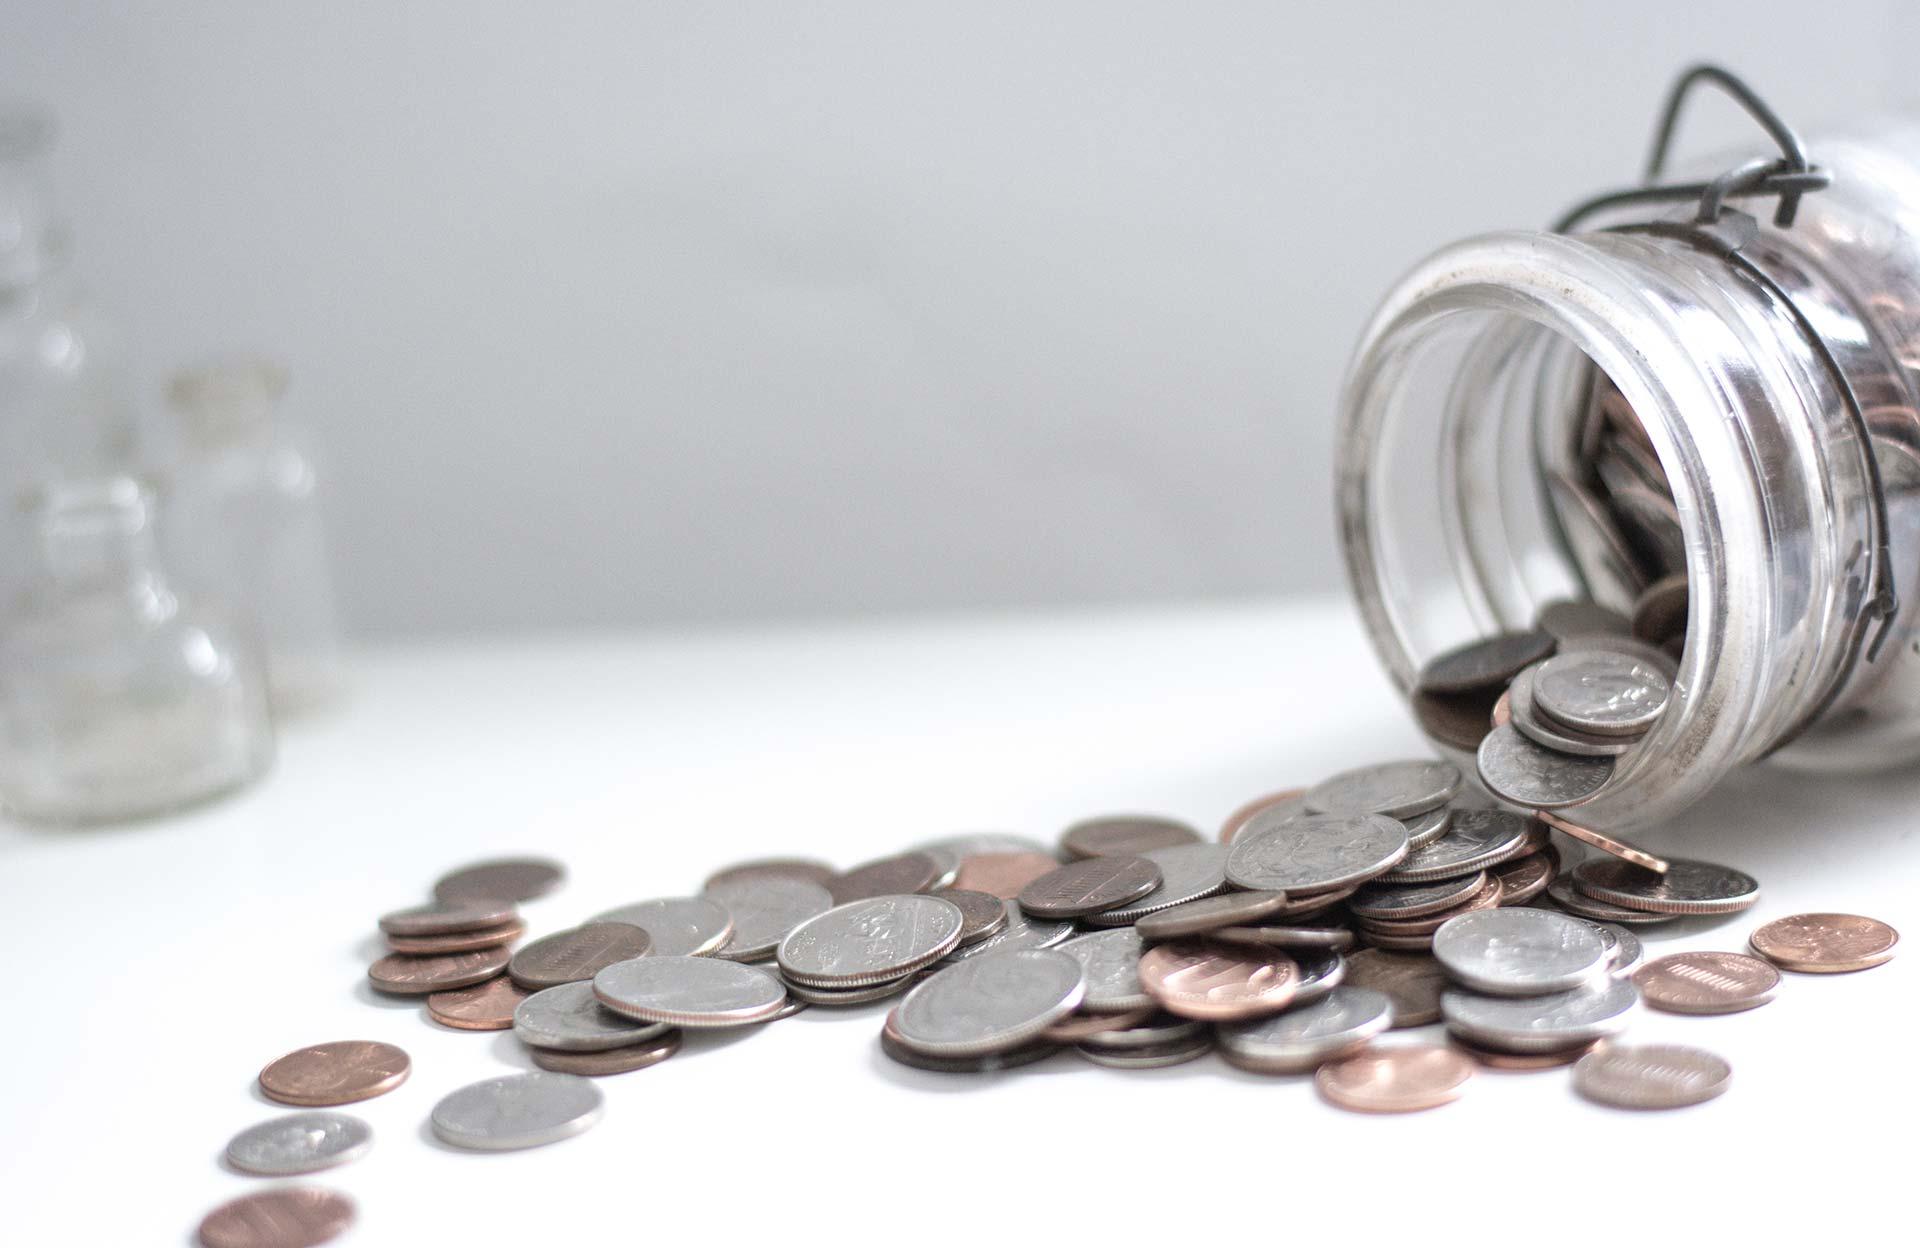 Coin collection jar